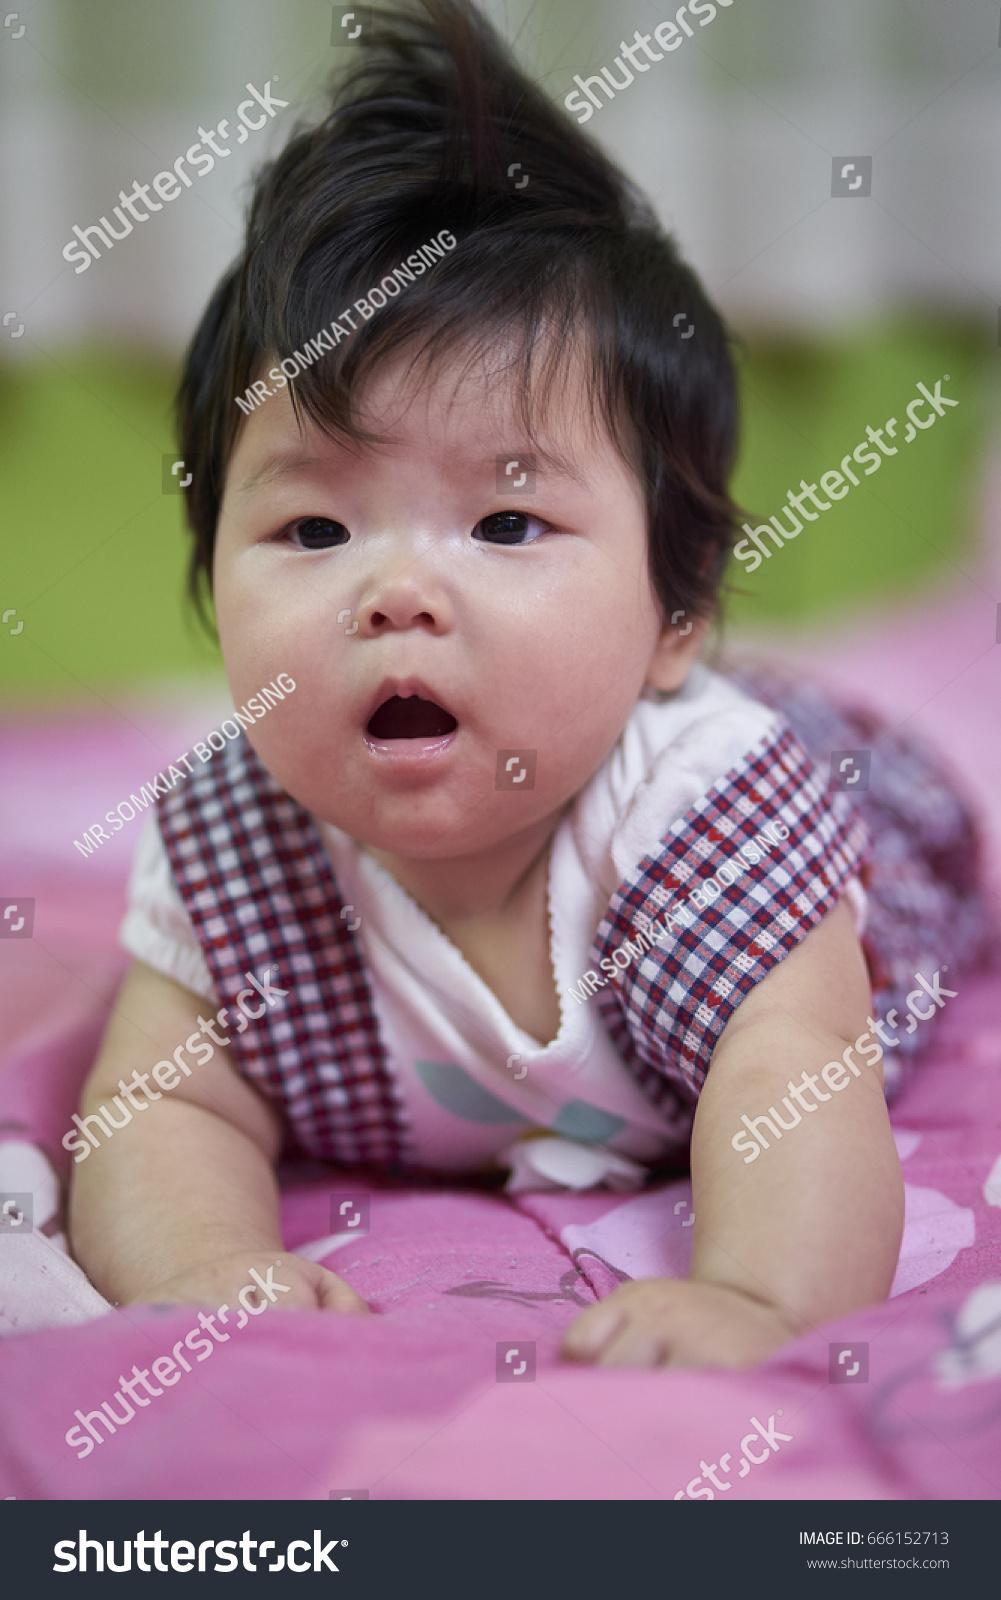 baby girl asian cute kids good stock photo (edit now) 666152713